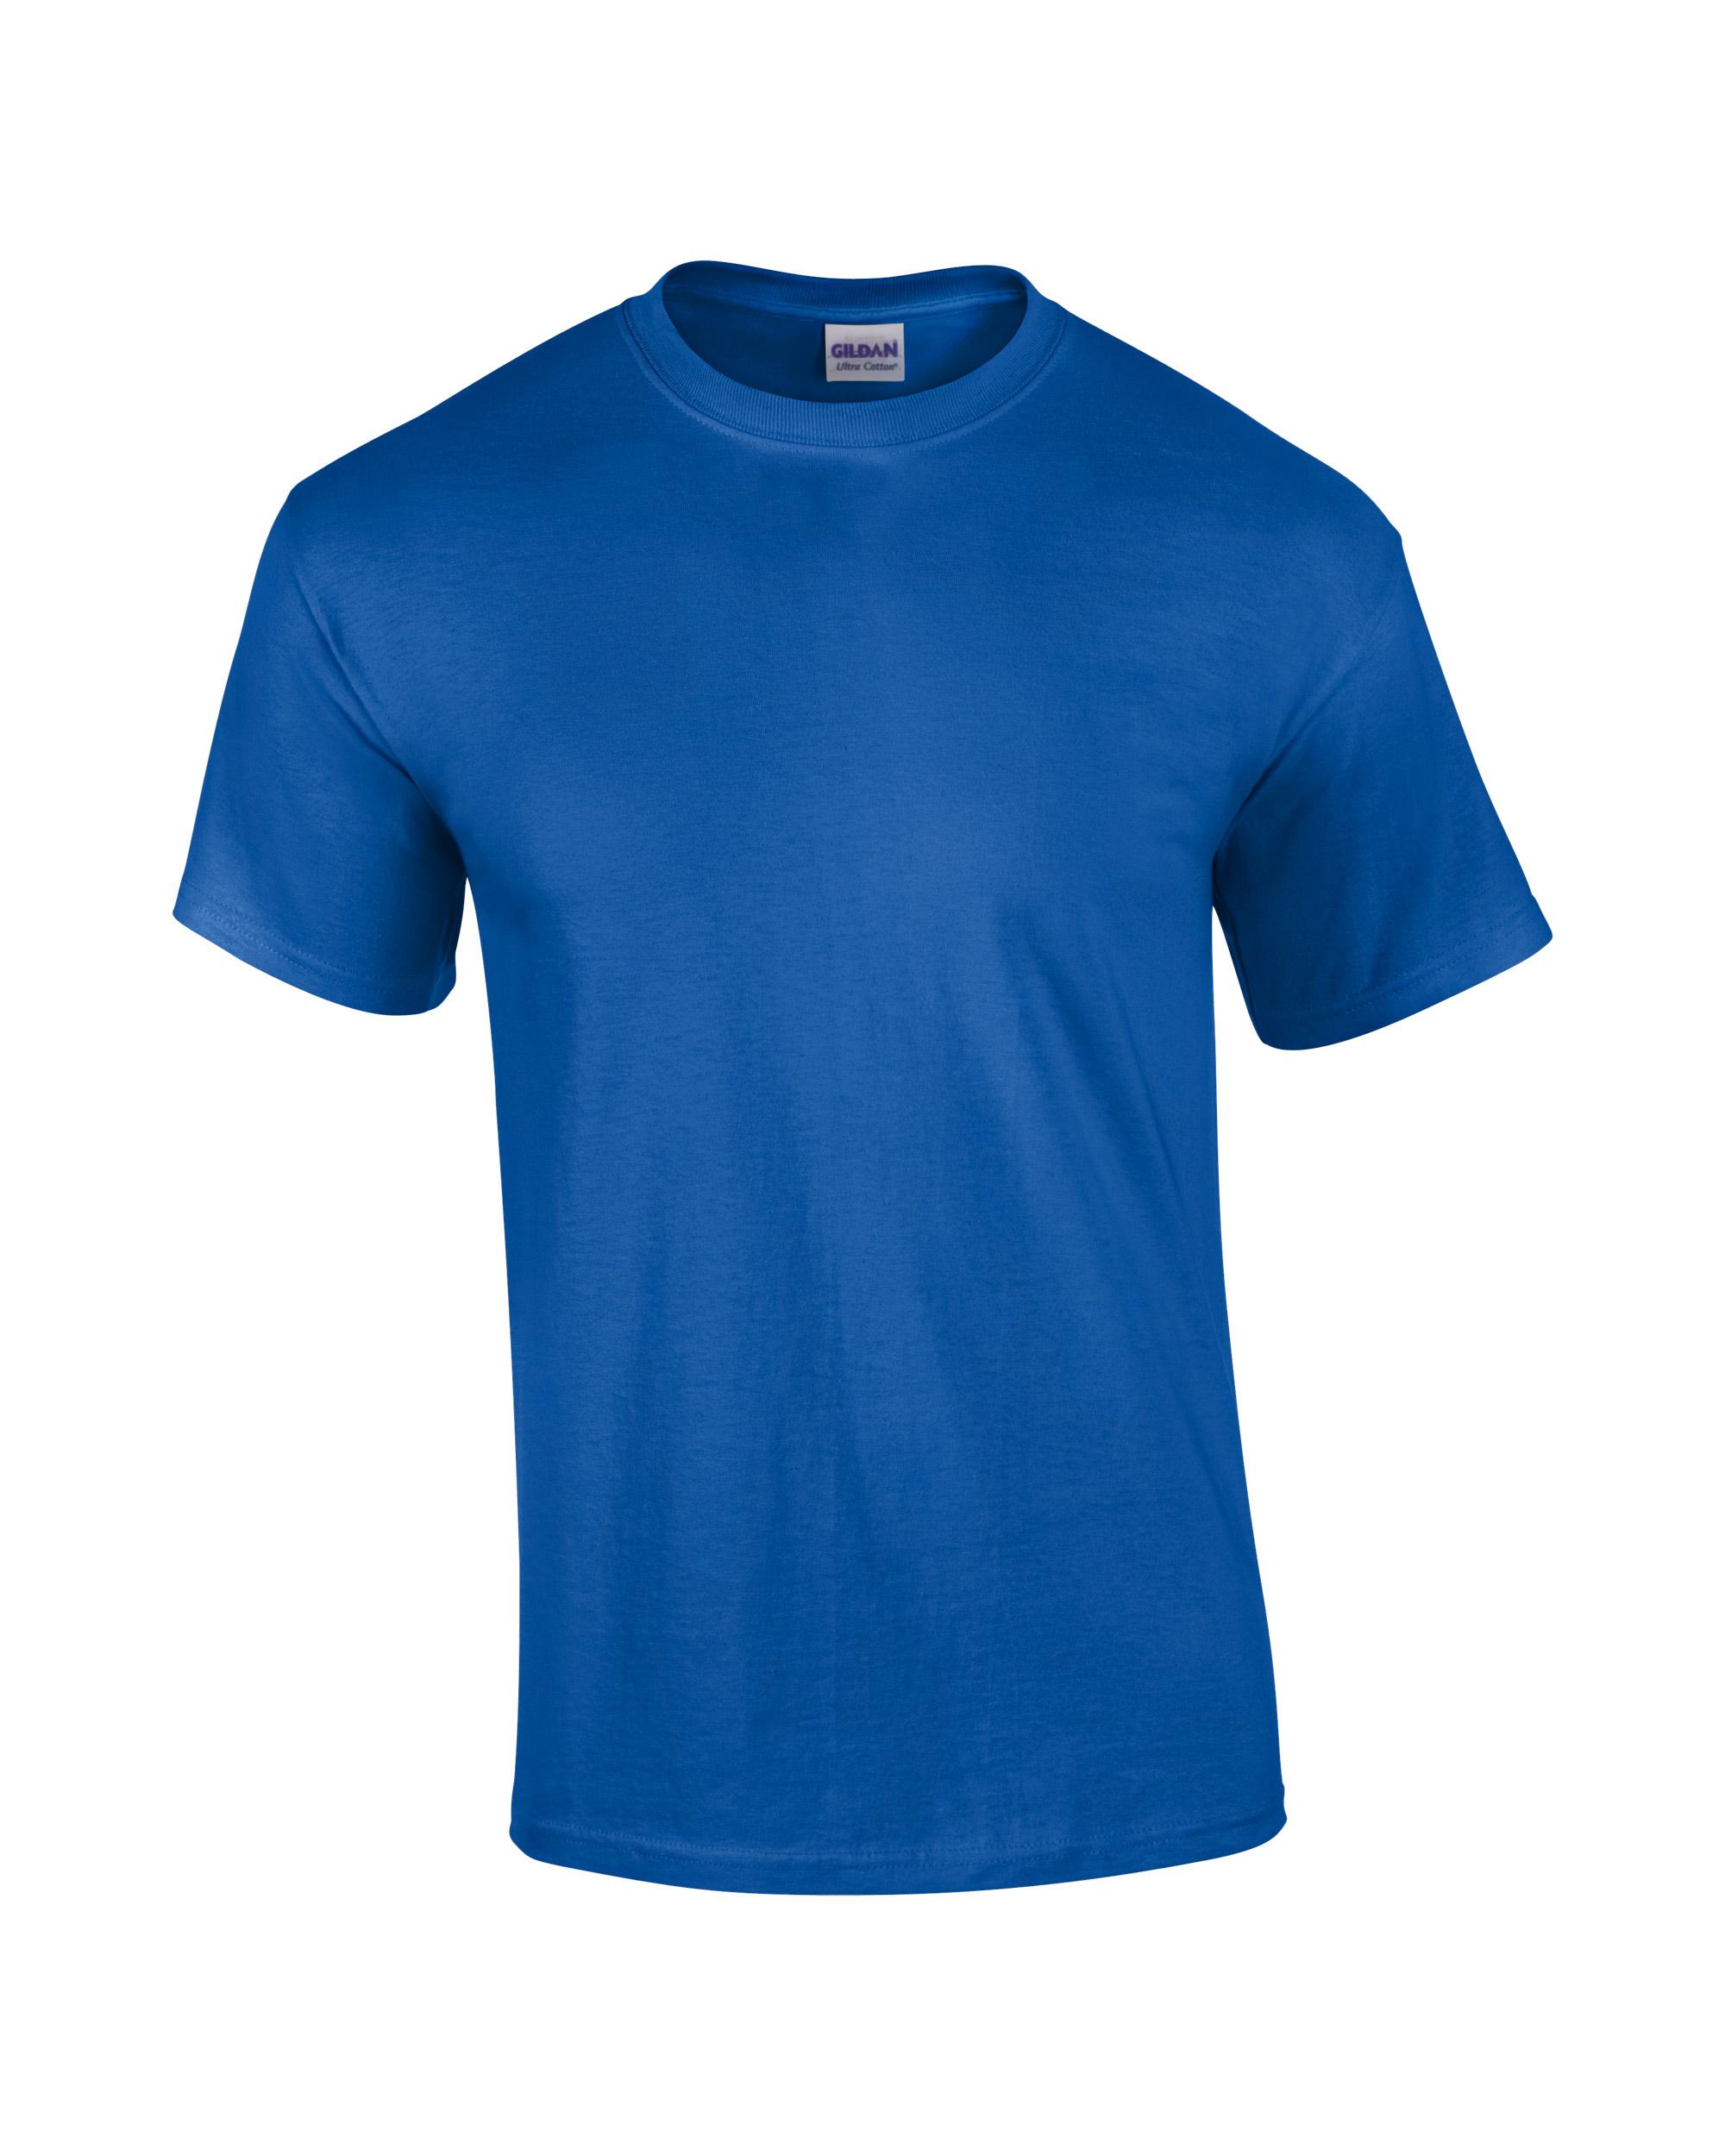 Unisex Gildan Ultra Cotton 6 Oz Tshirt Team Shirt Pros